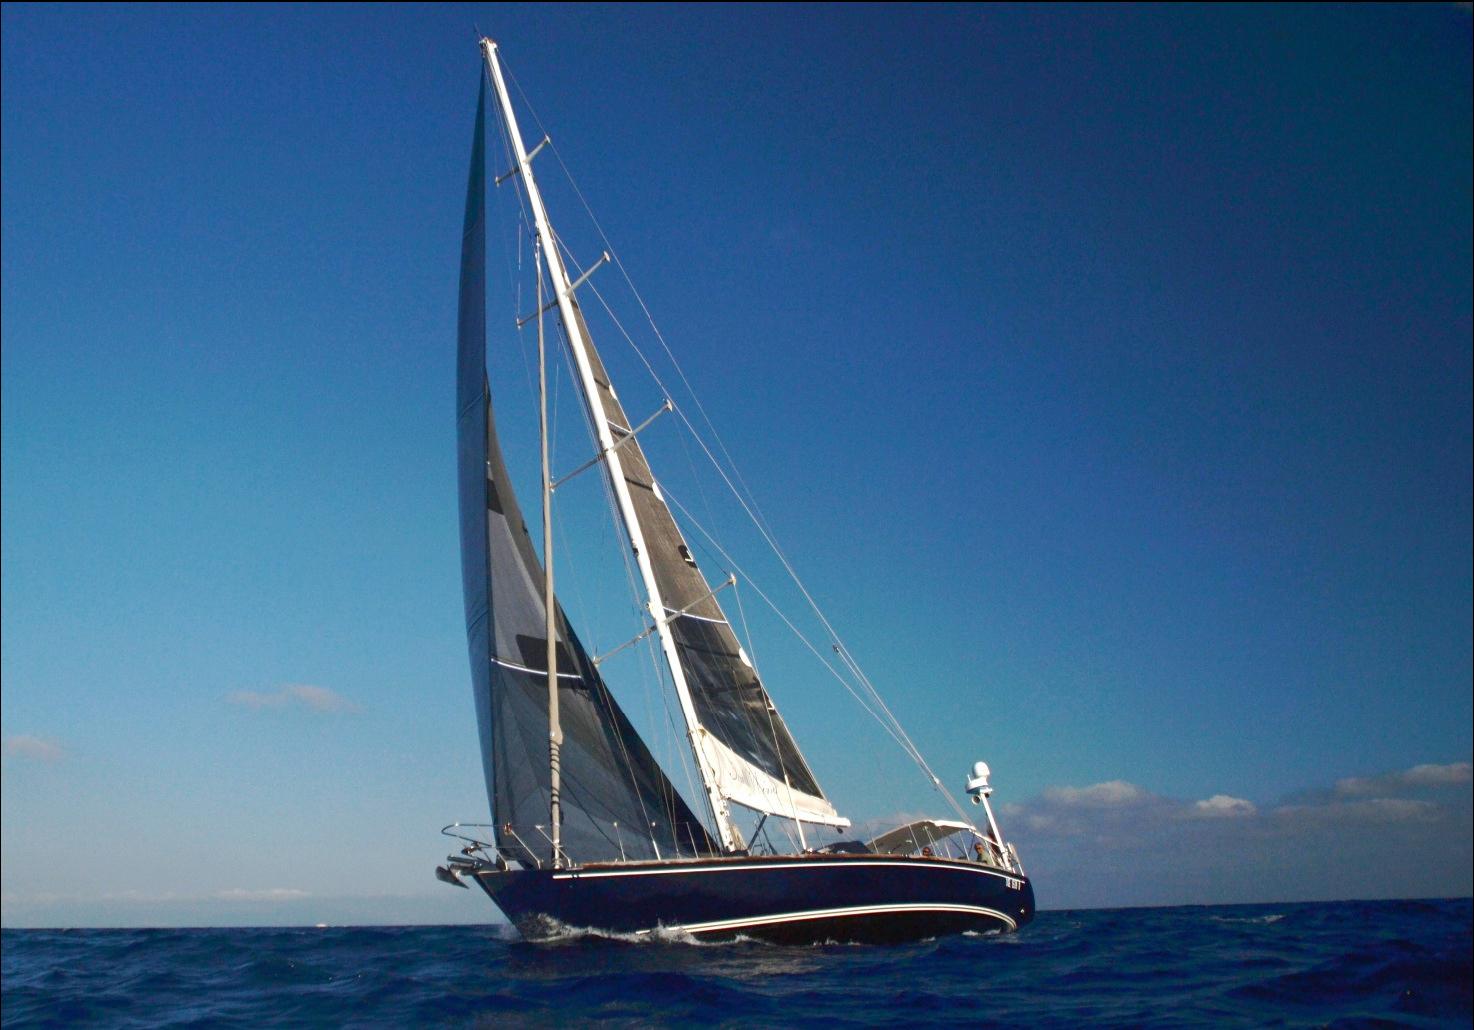 south wind 65 under sail